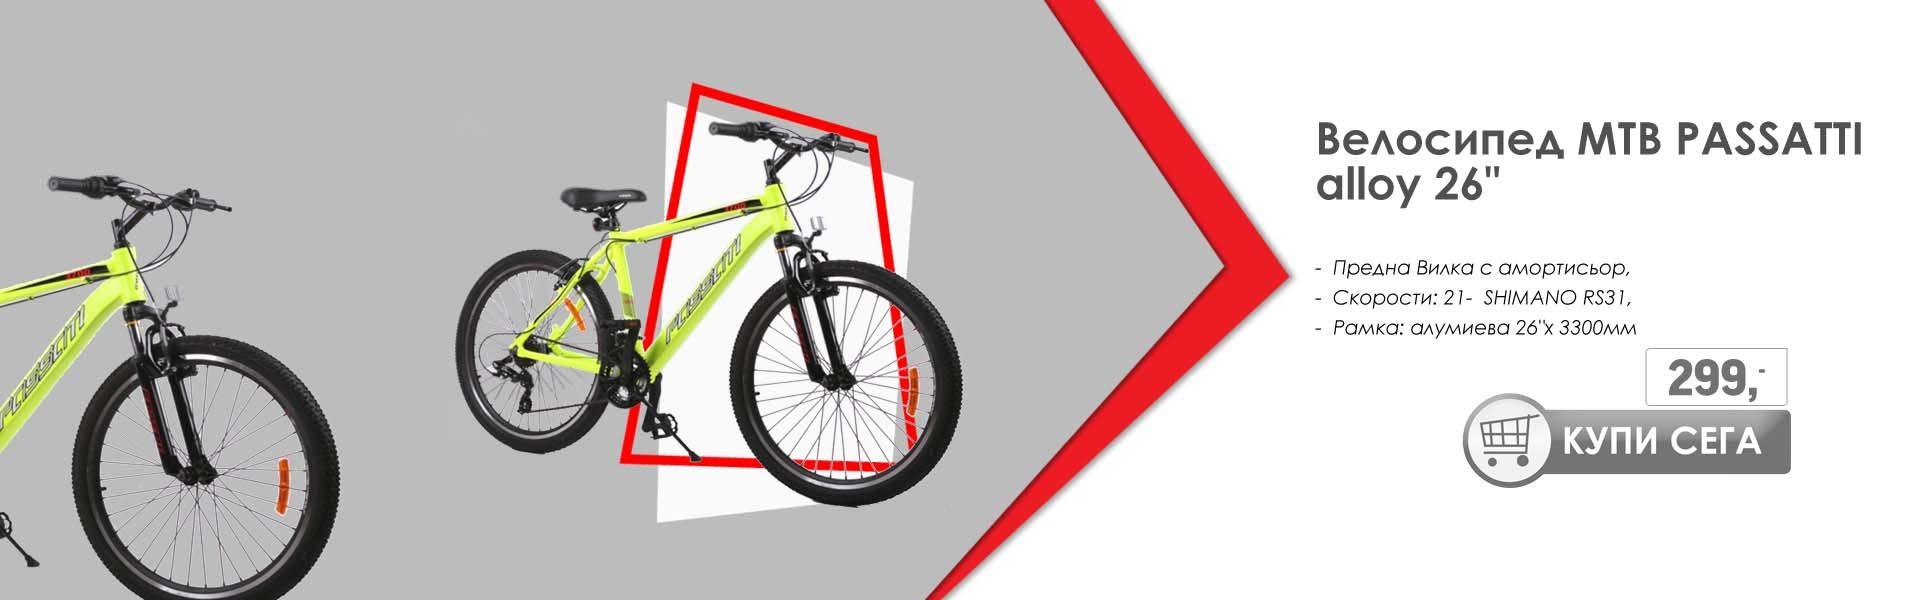 Велосипед MTB PASSATTI